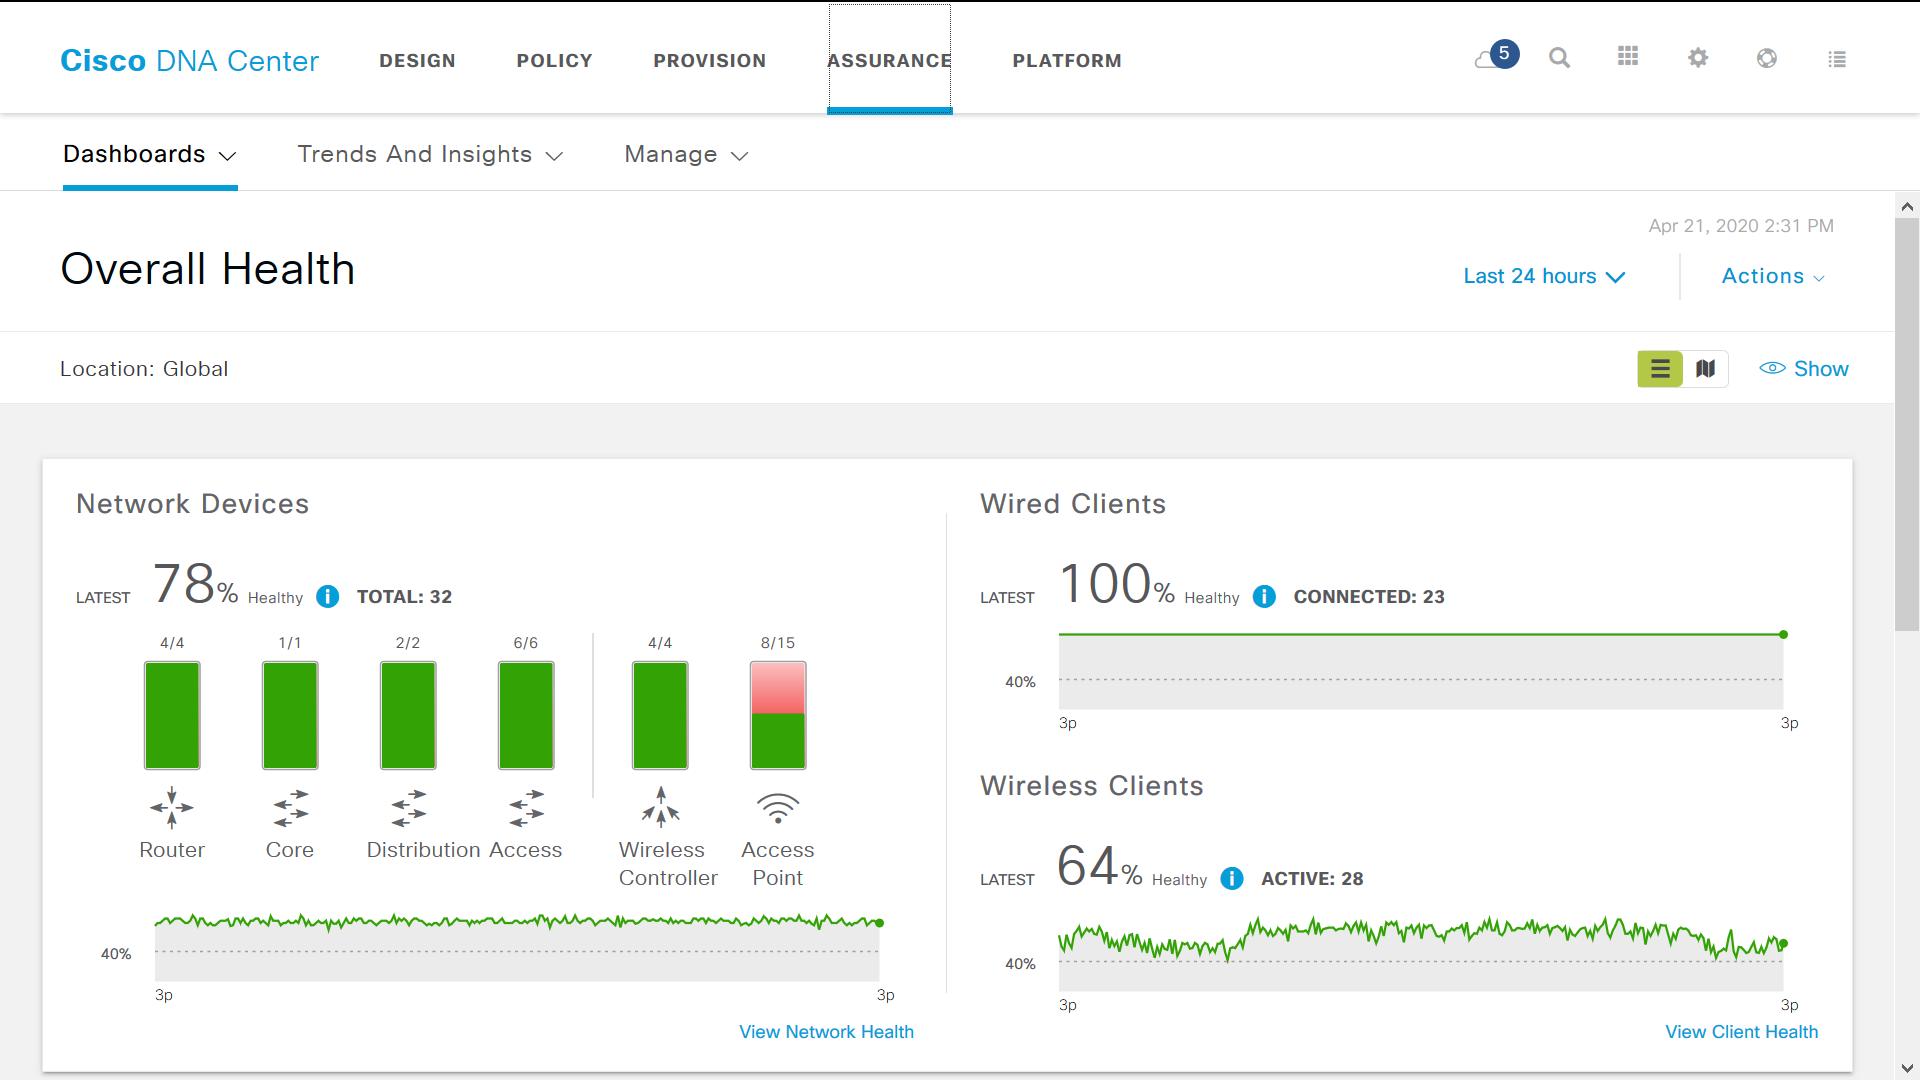 Cisco DNA Center - Overall Network Health dashboard